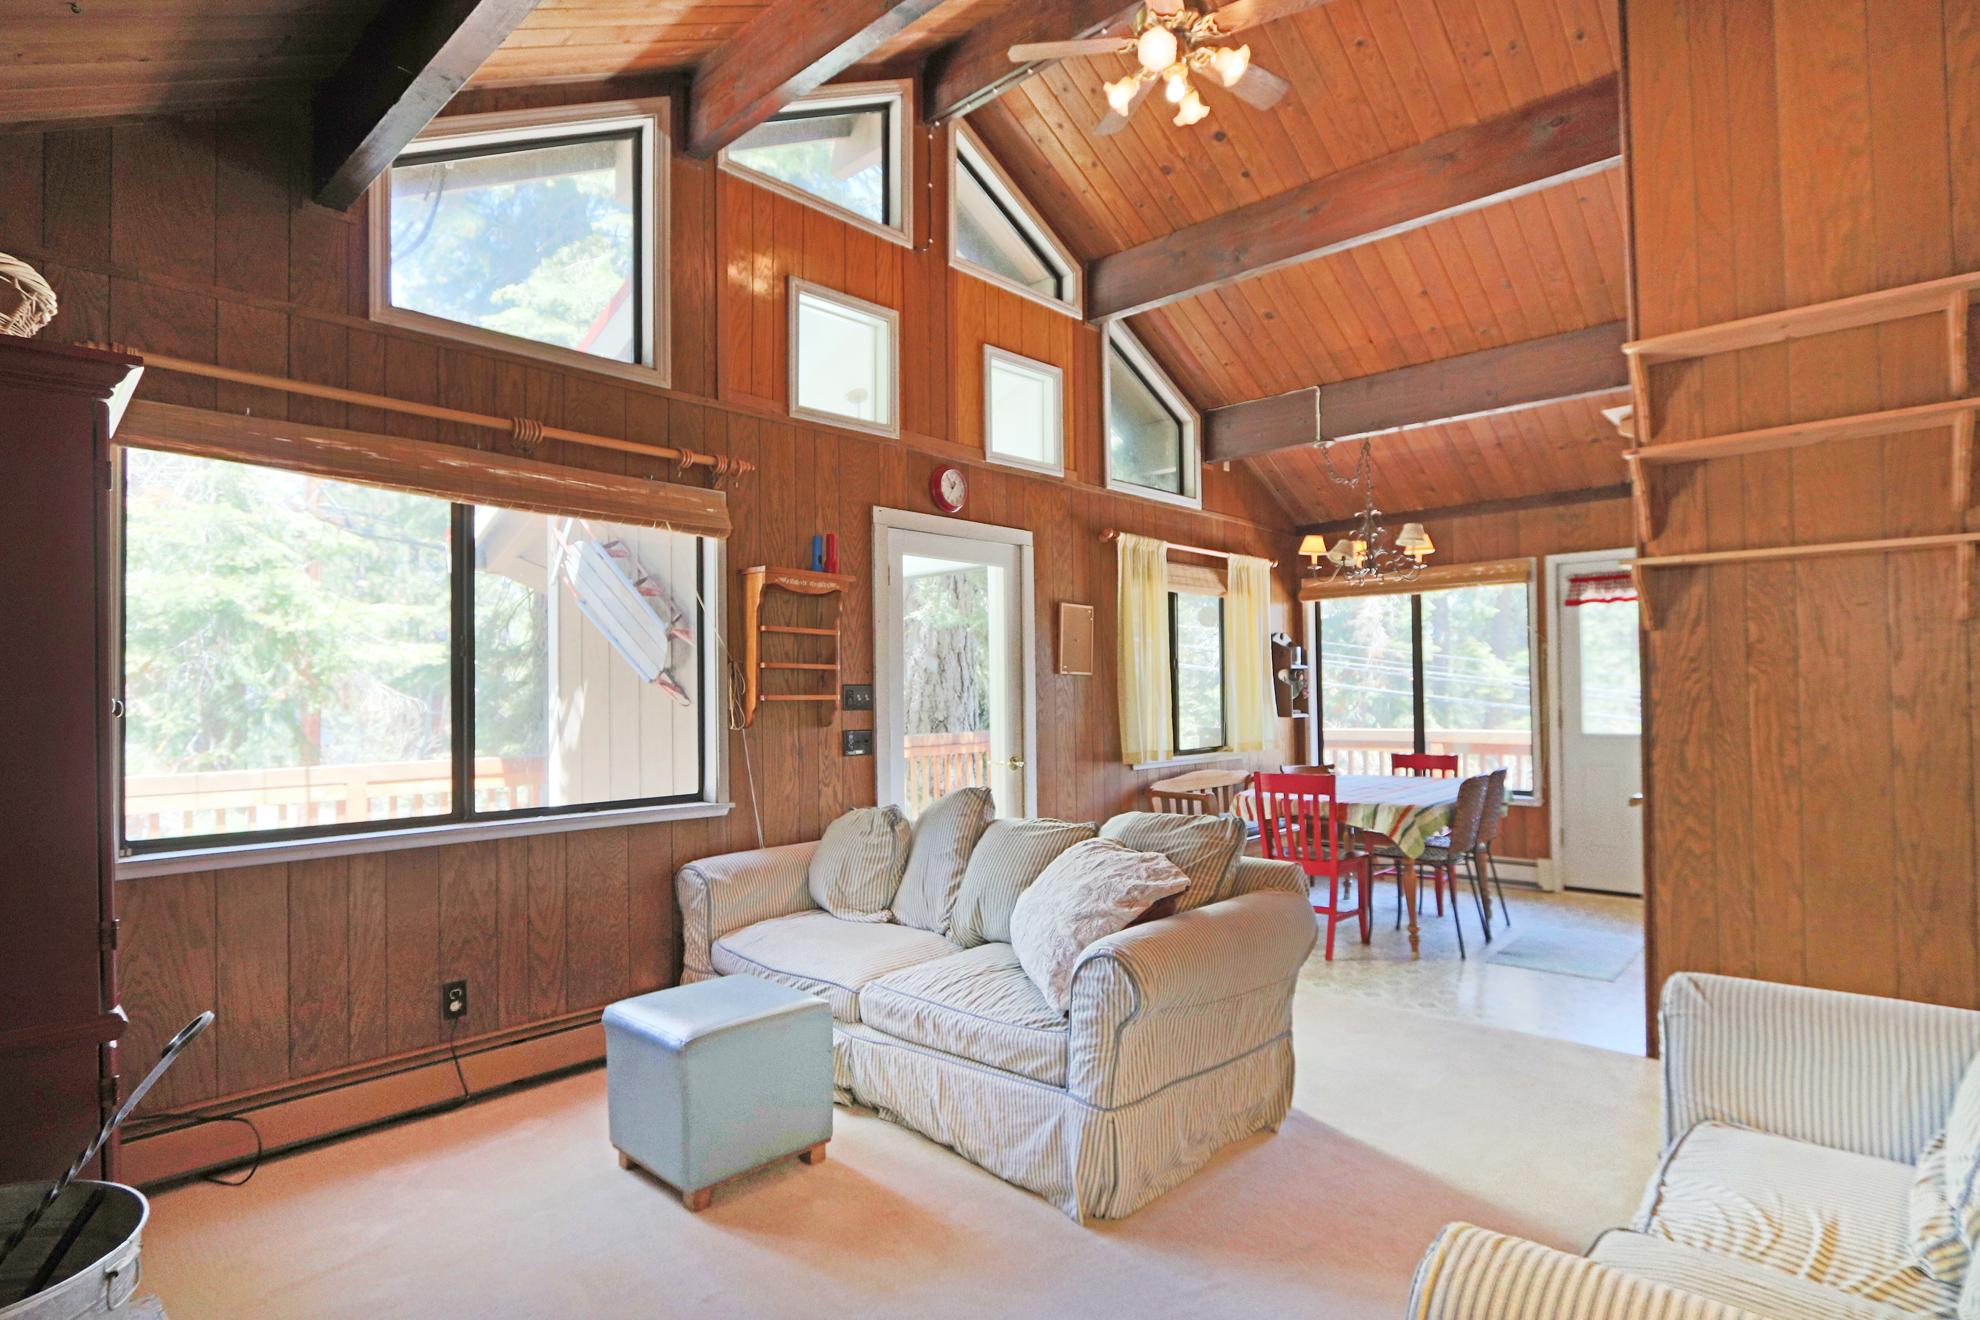 Listing Image 6 for Kerber House